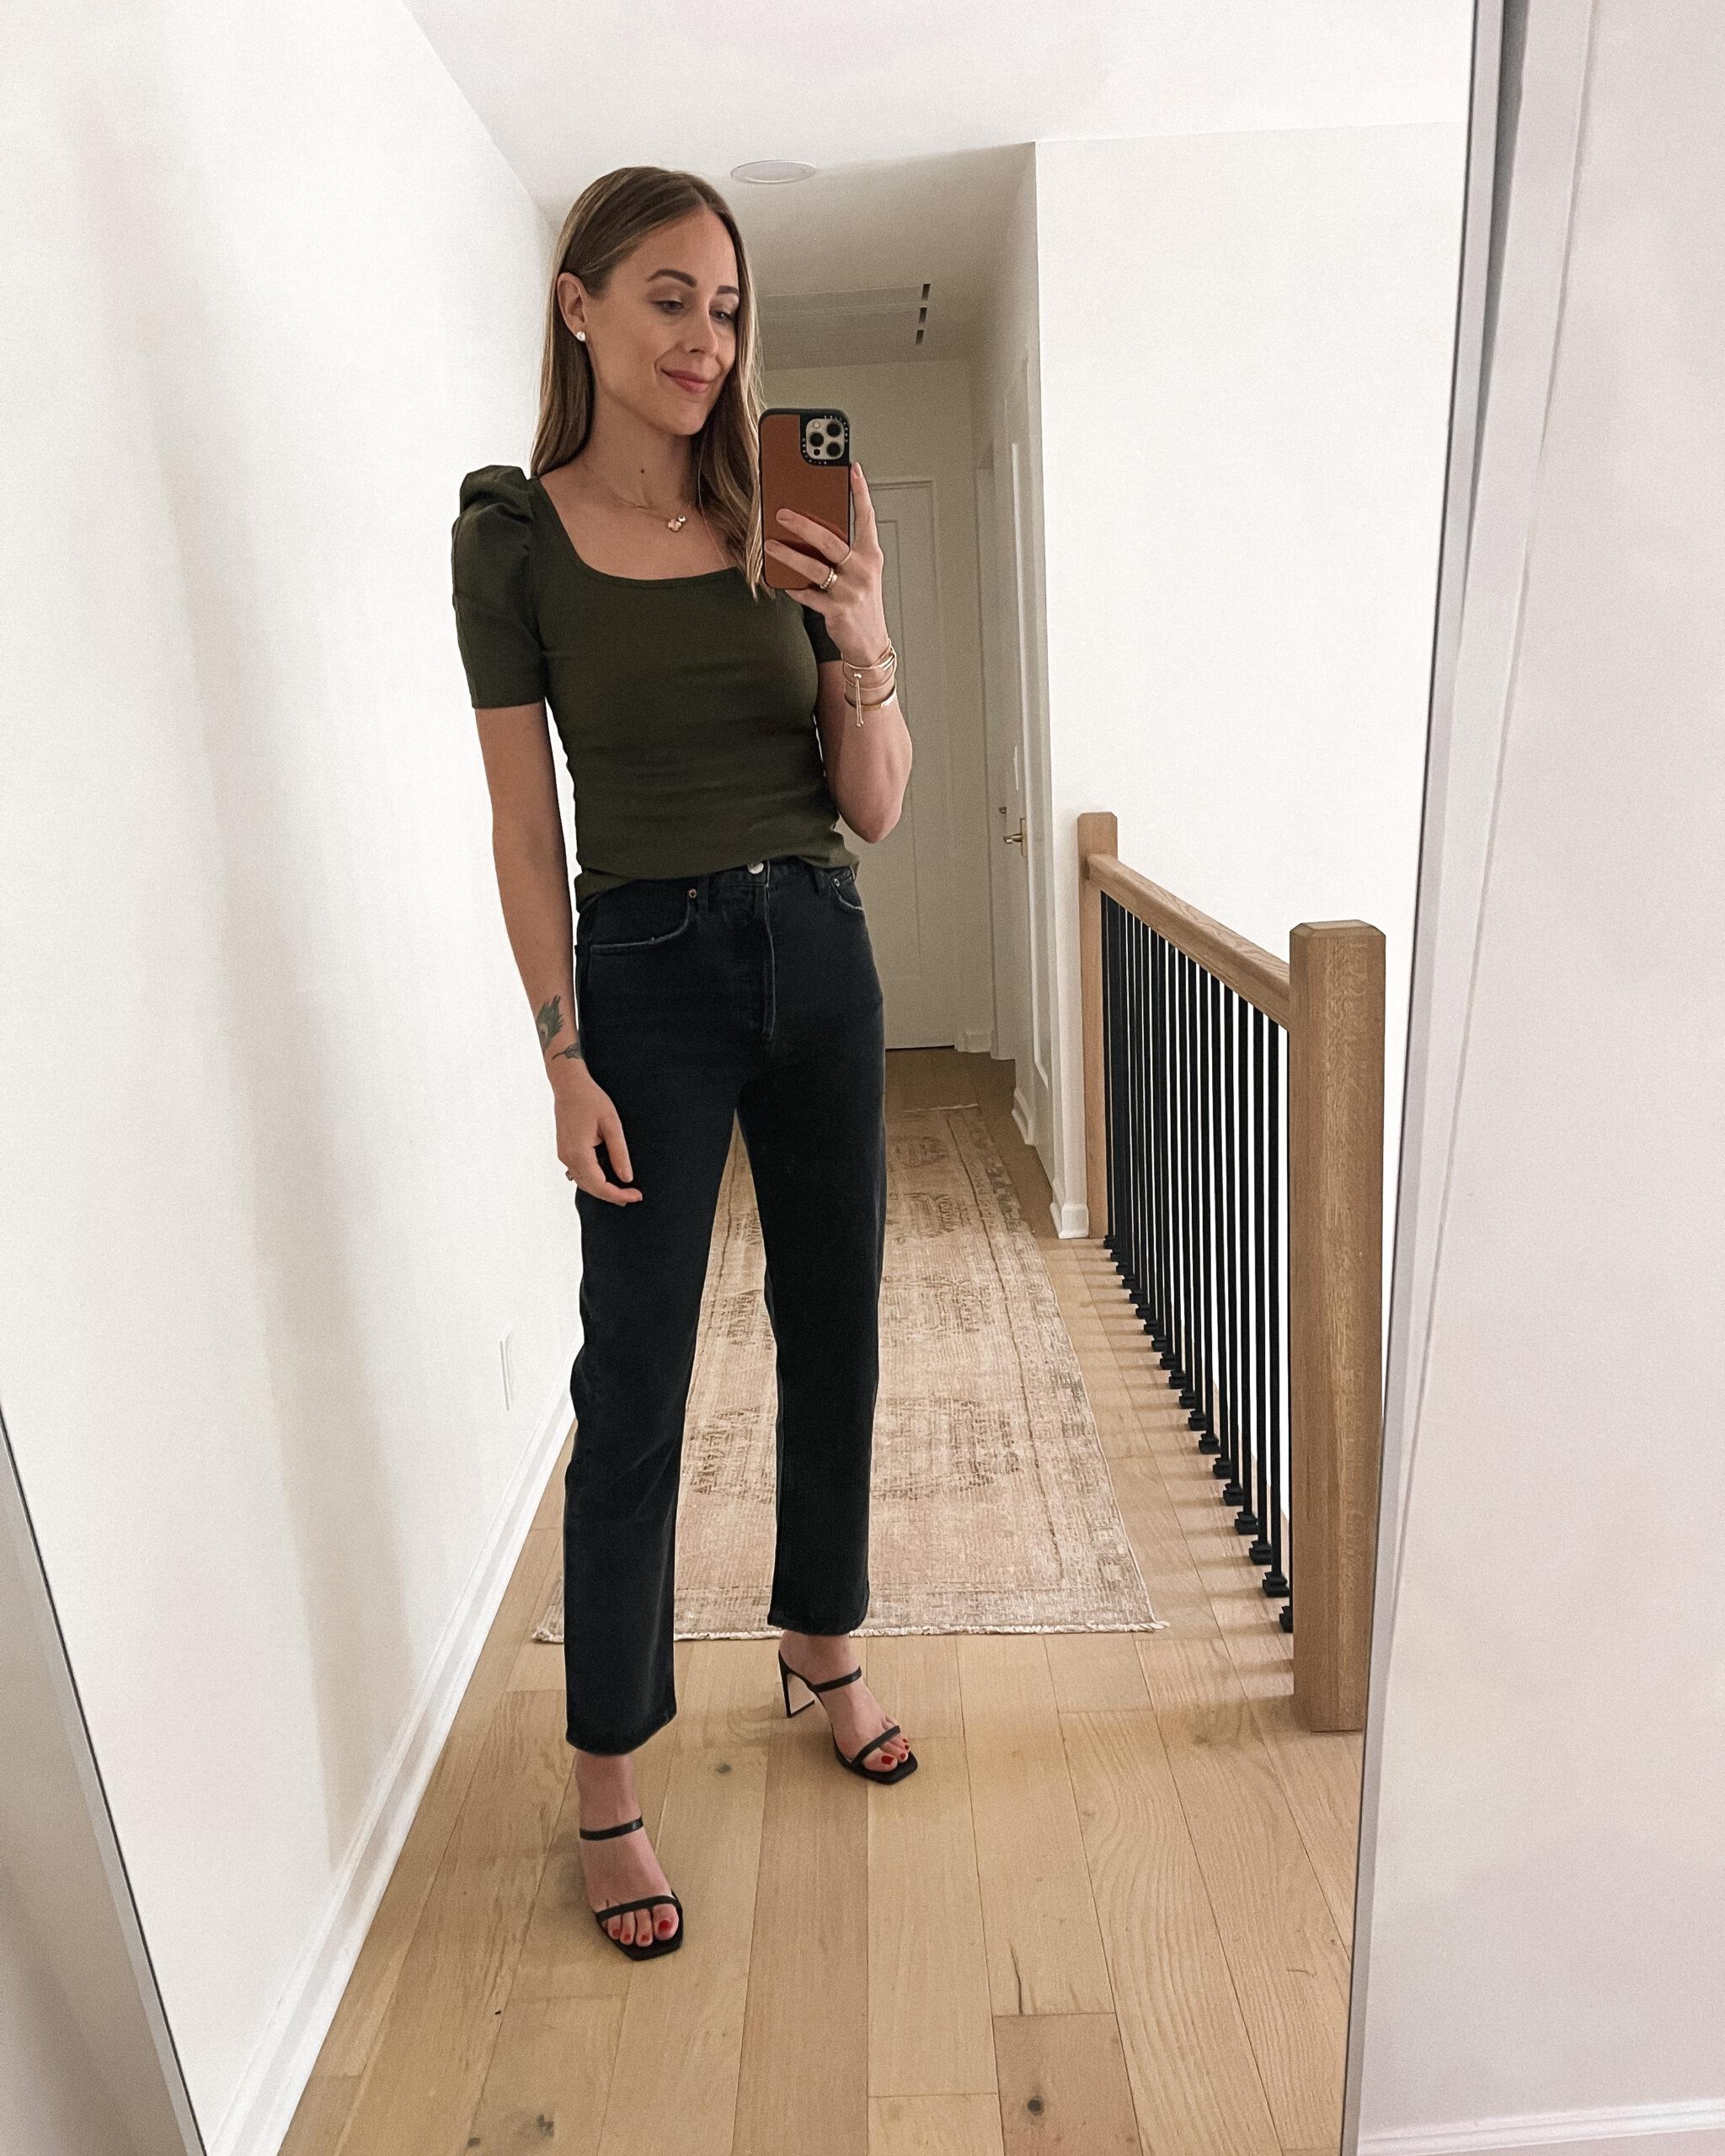 Fashion Jackson Wearing Amazon Fashion Green Puff Sleeve Top Black Jeans Black Heeled Sandals